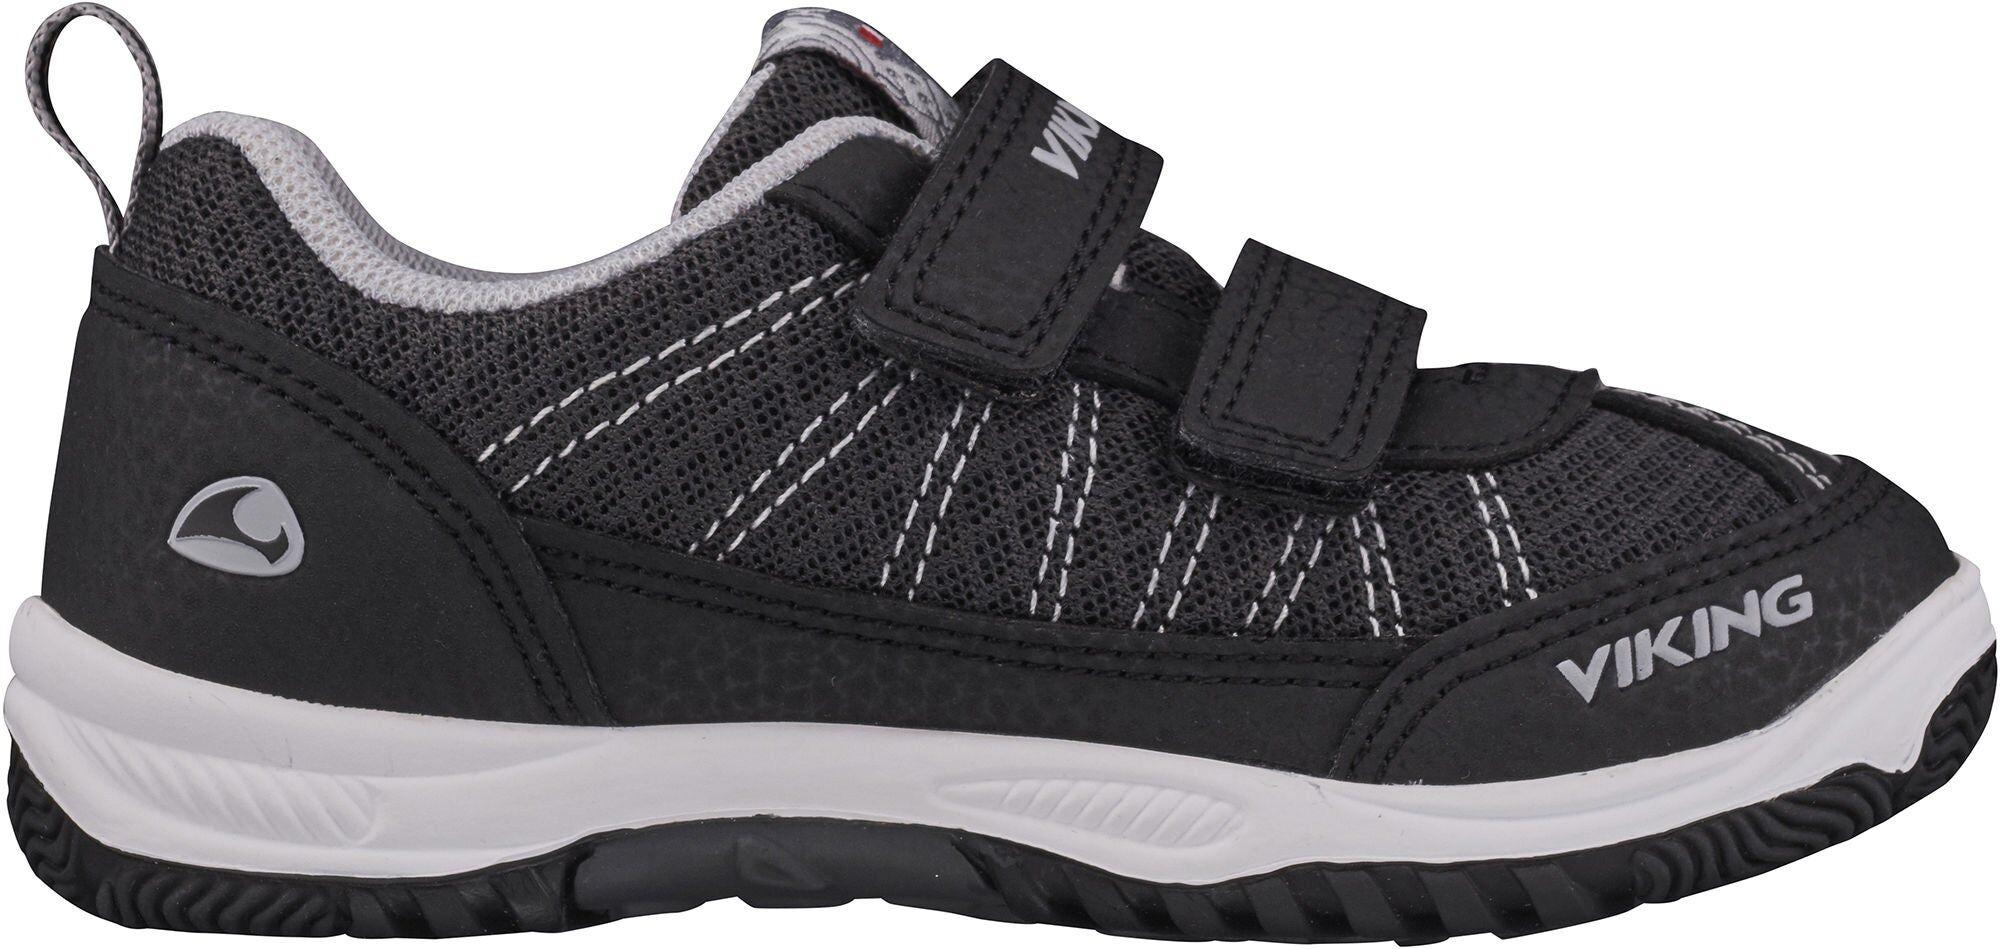 Viking Bryne Sneaker, Black/Grey 24